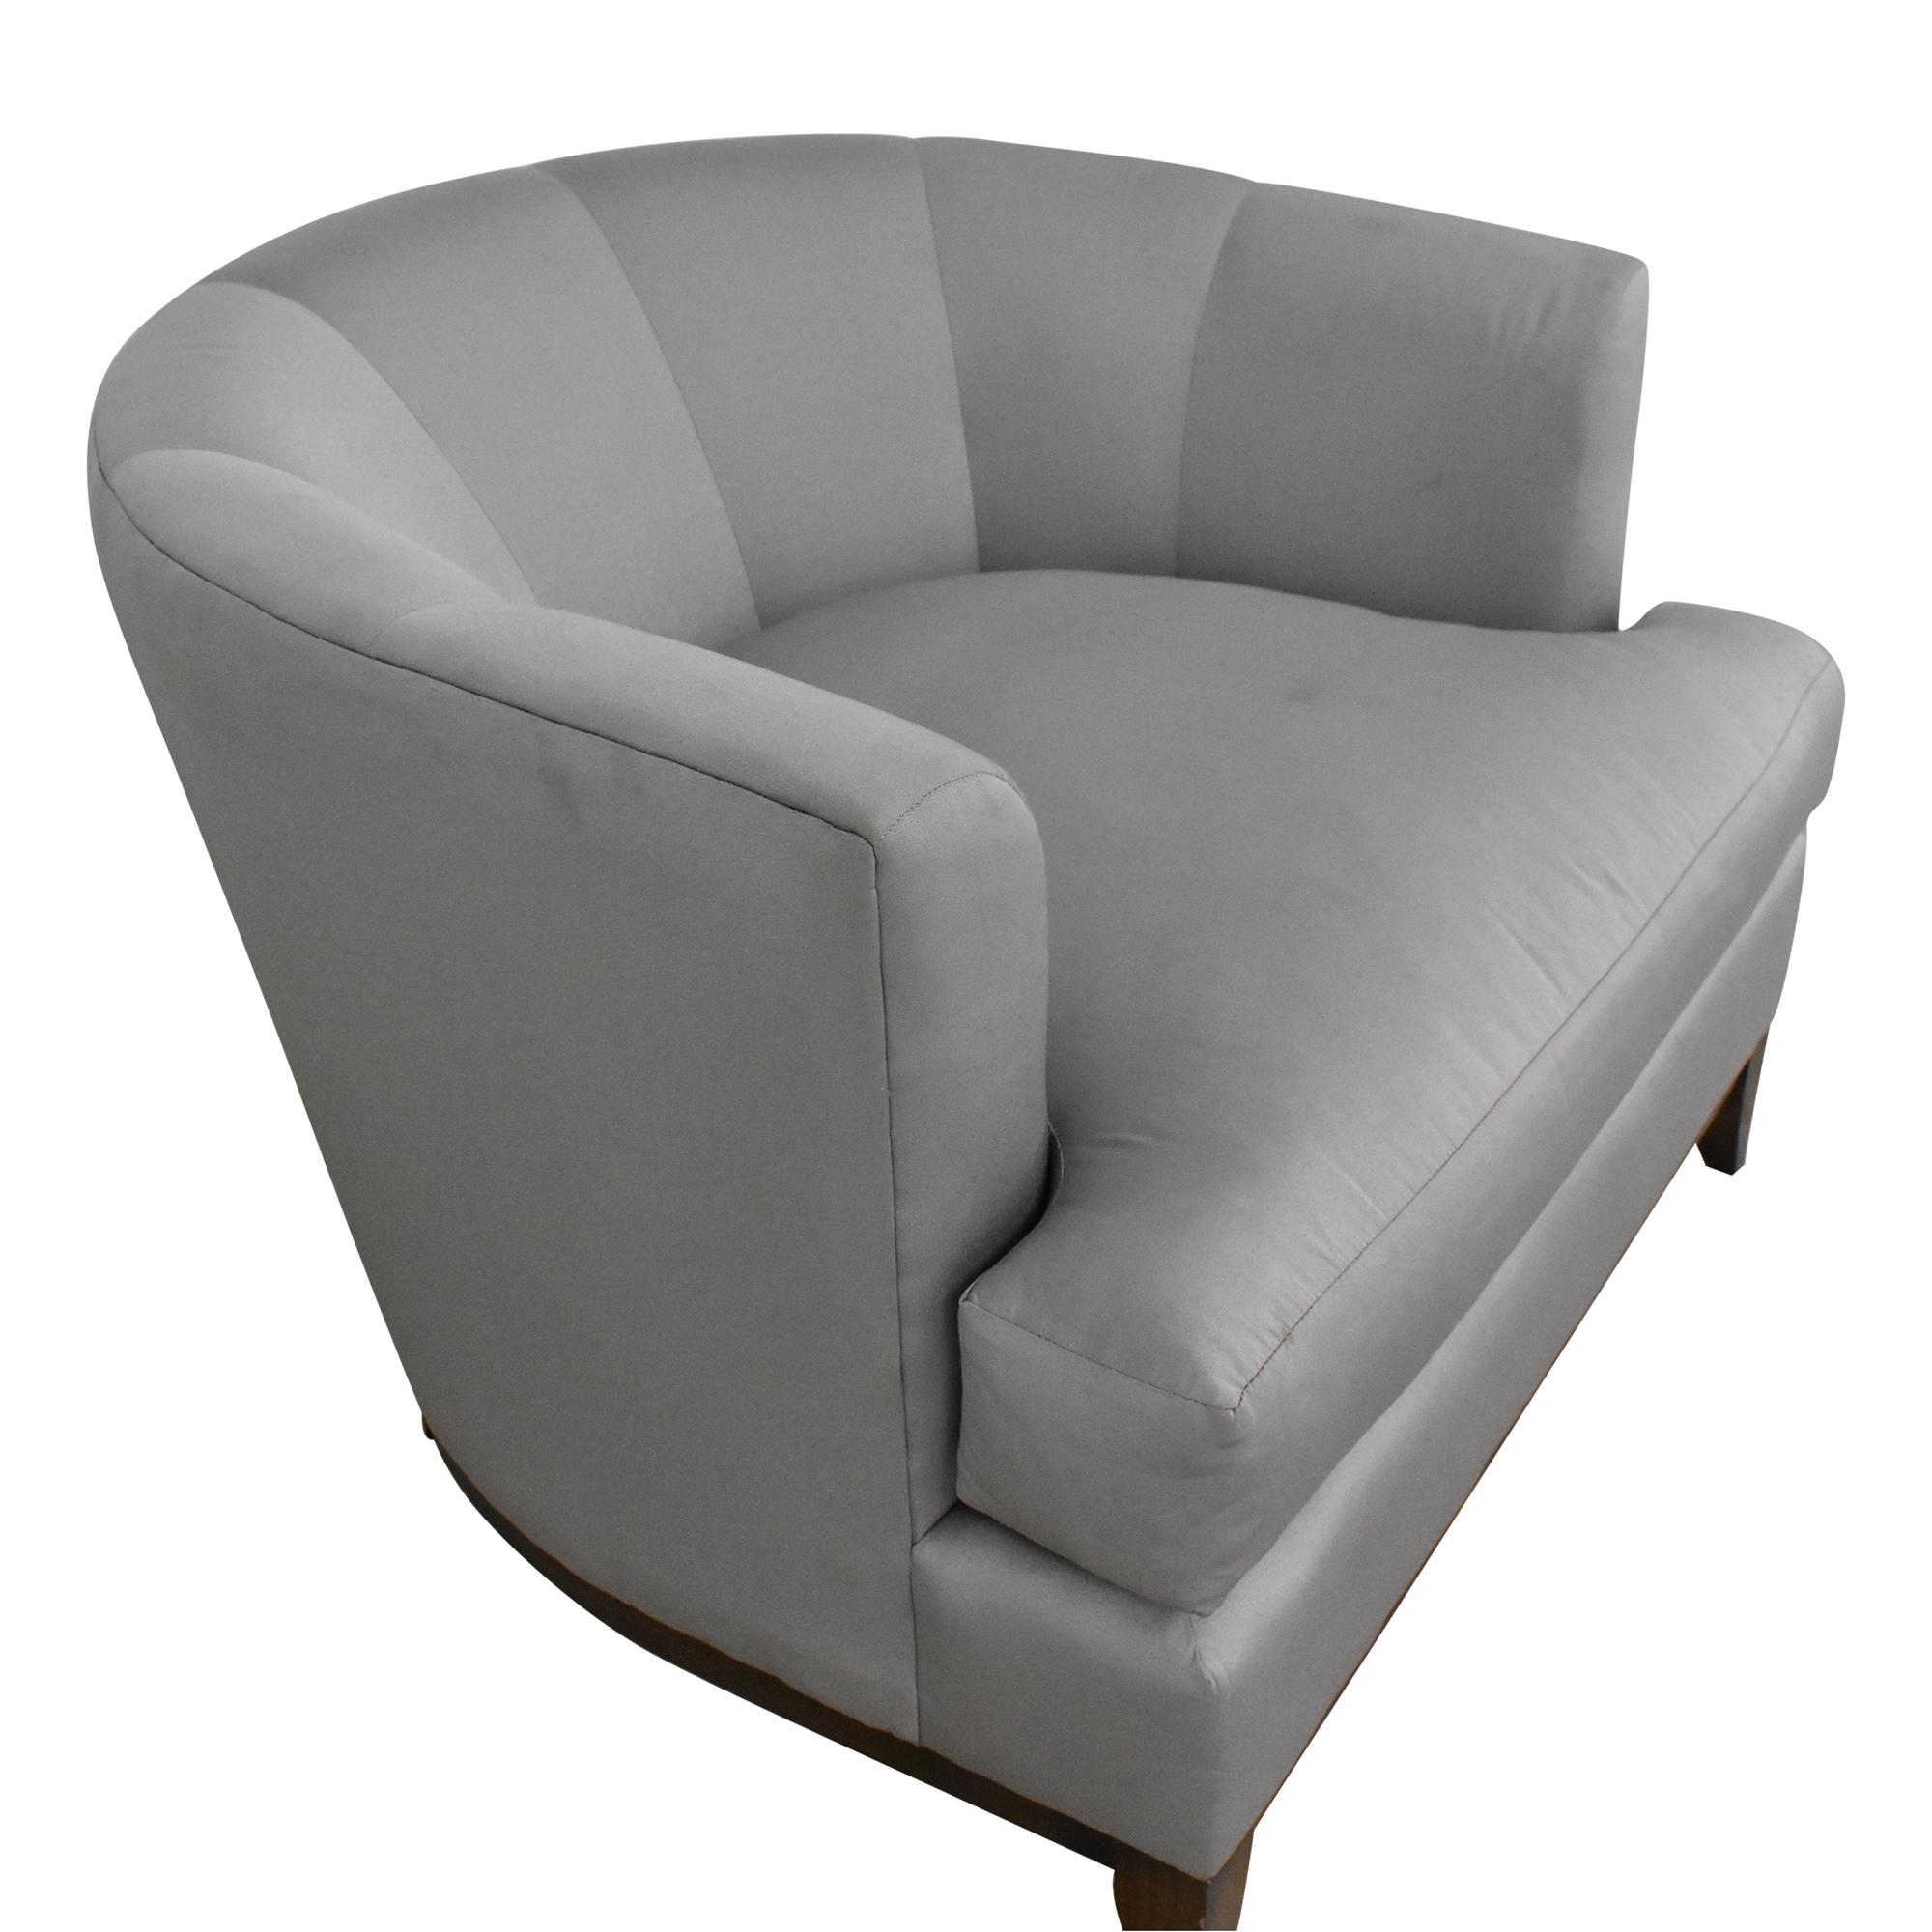 shop Barbara Barry Barbara Barry for Henredon Channel Back Tub Chair online